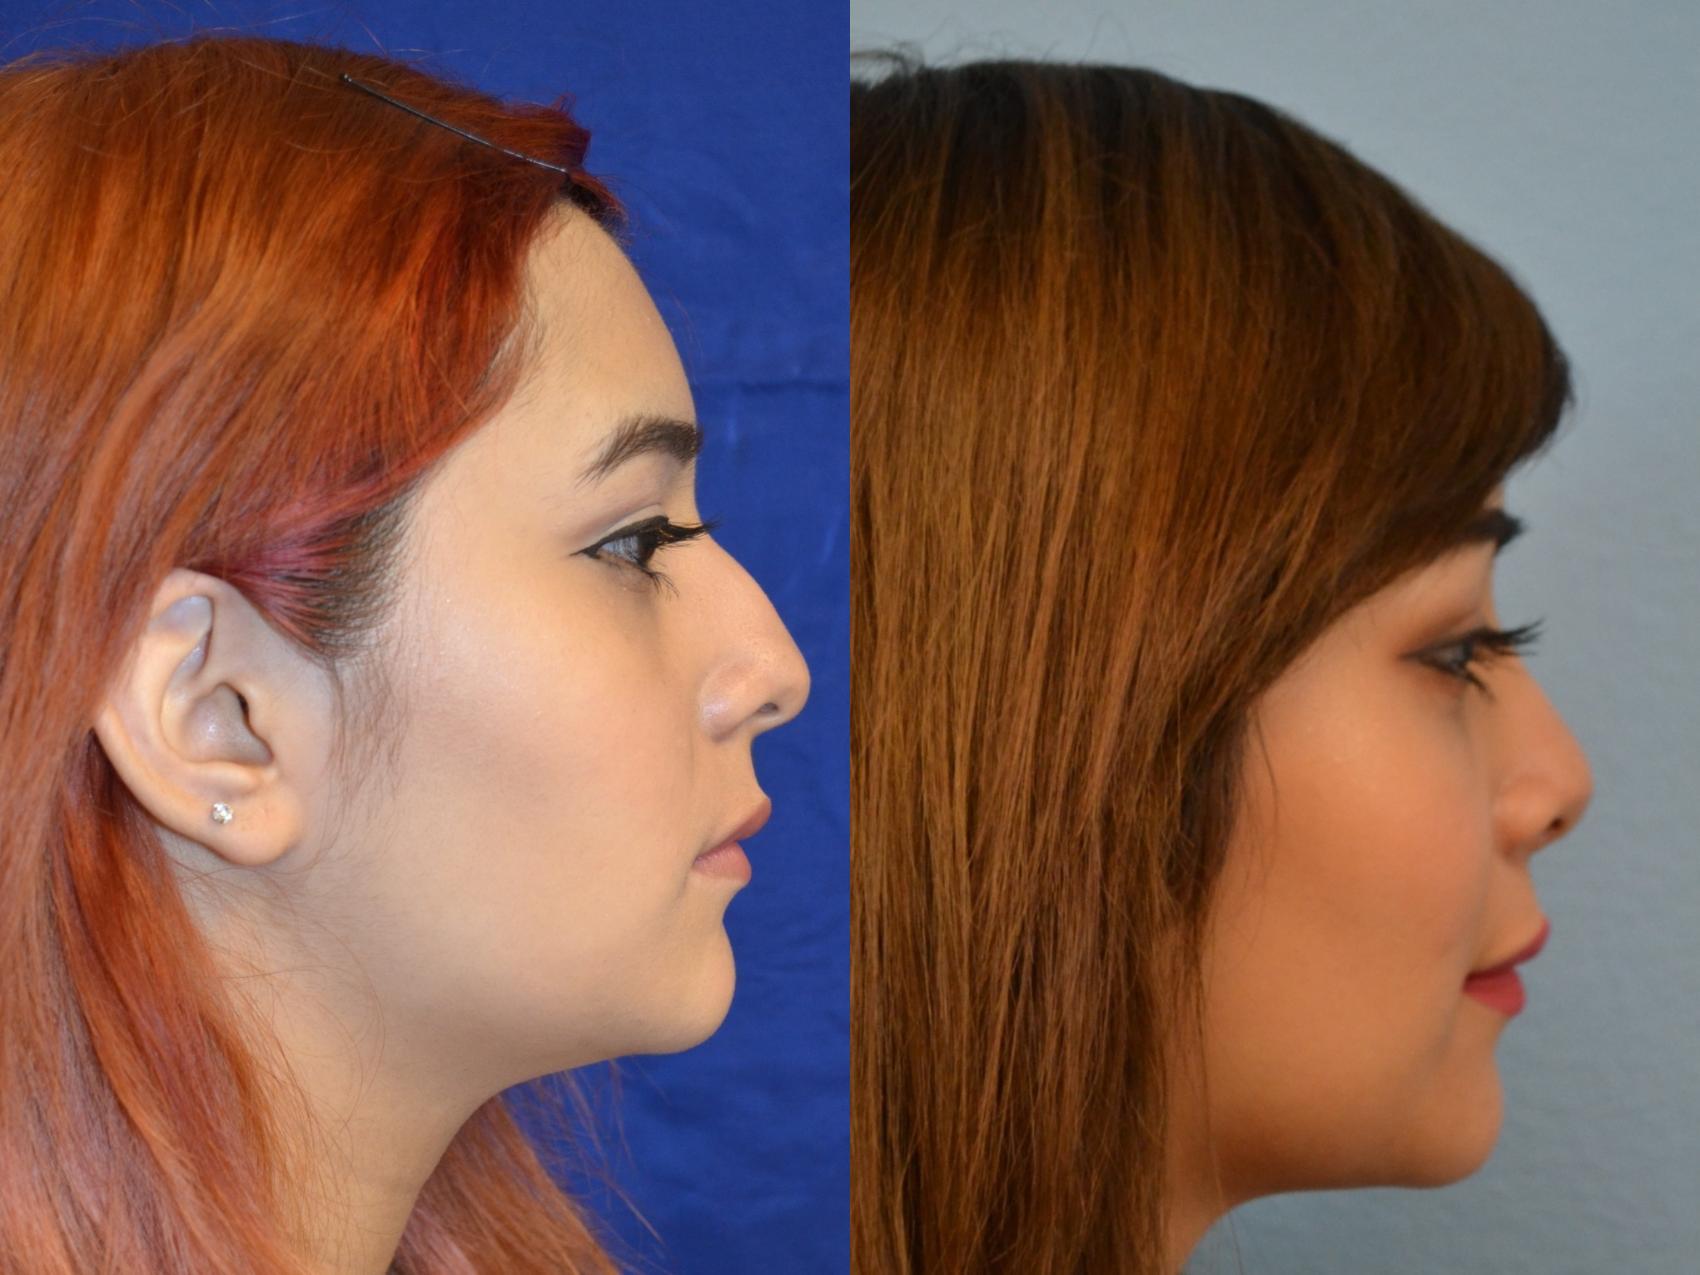 Nose Job (Rhinoplasty)